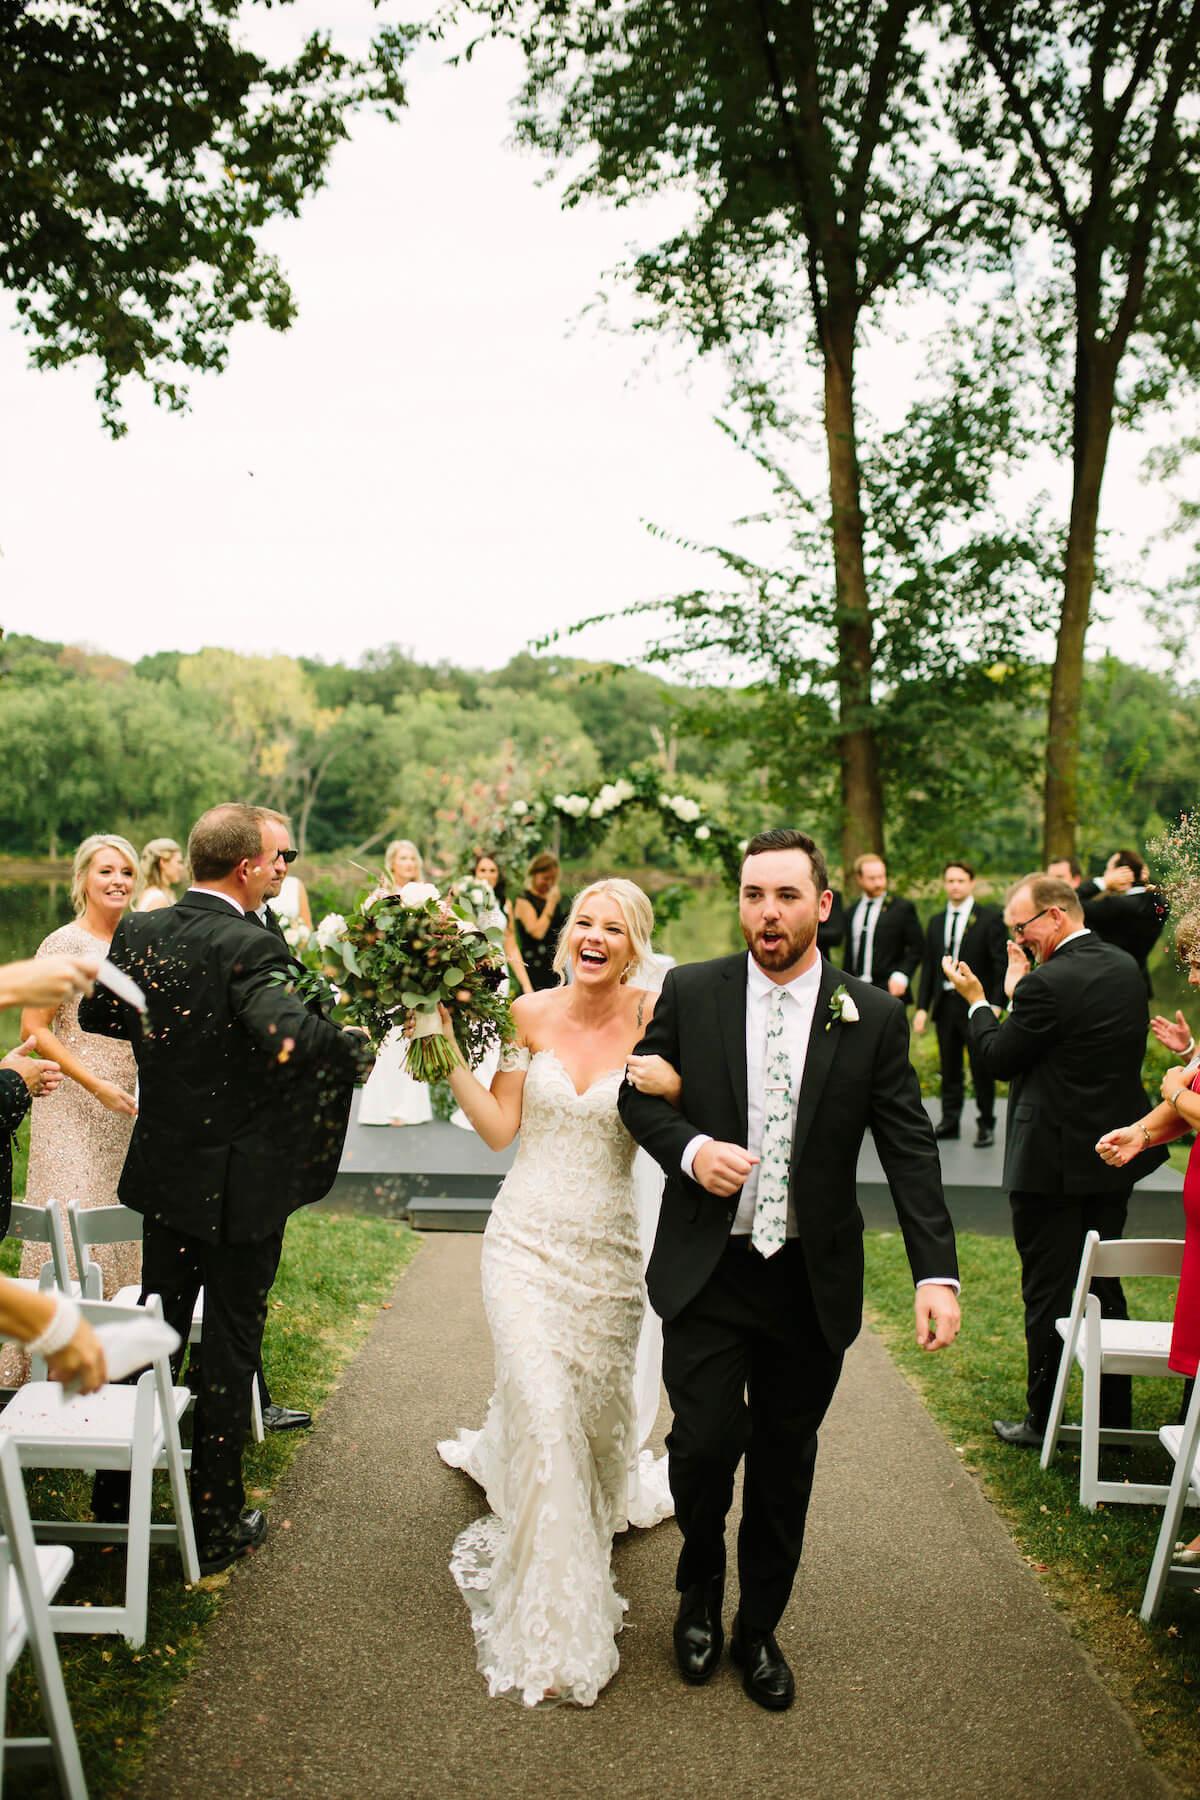 engle-olson-april-cj-wedding-jessica-holleque-10.jpg